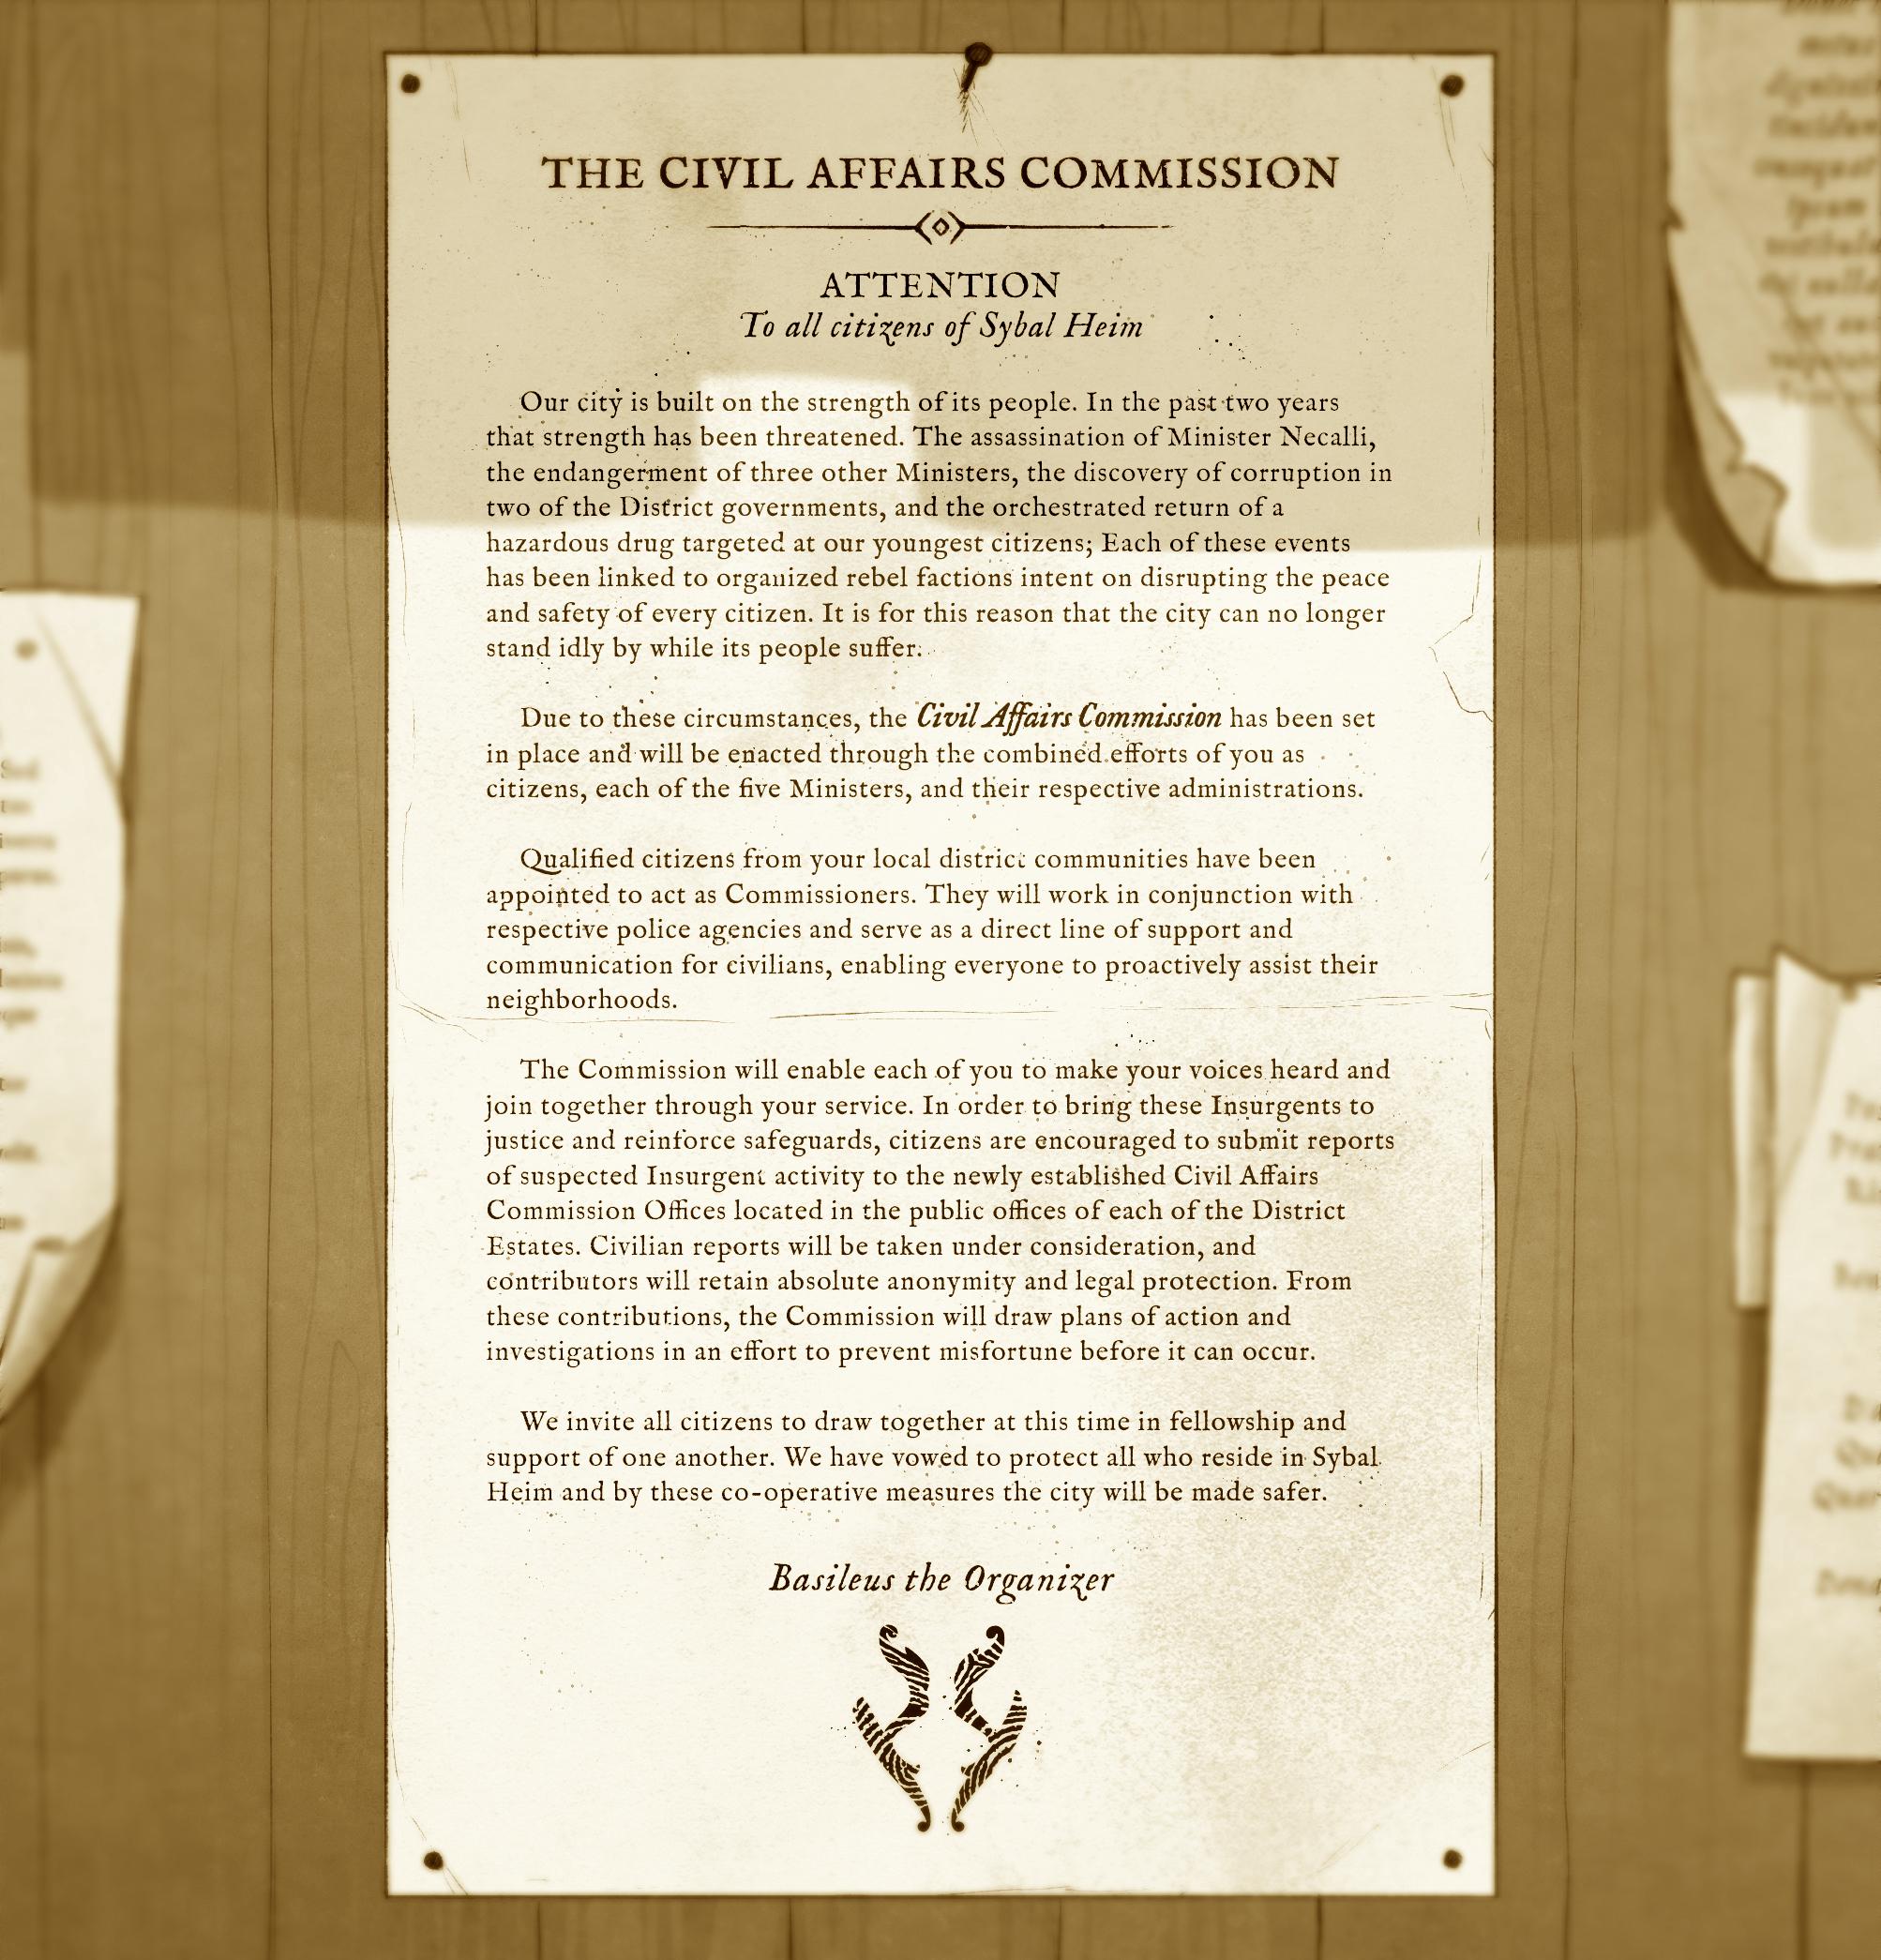 The Civil Affairs Commission (RPG promo)